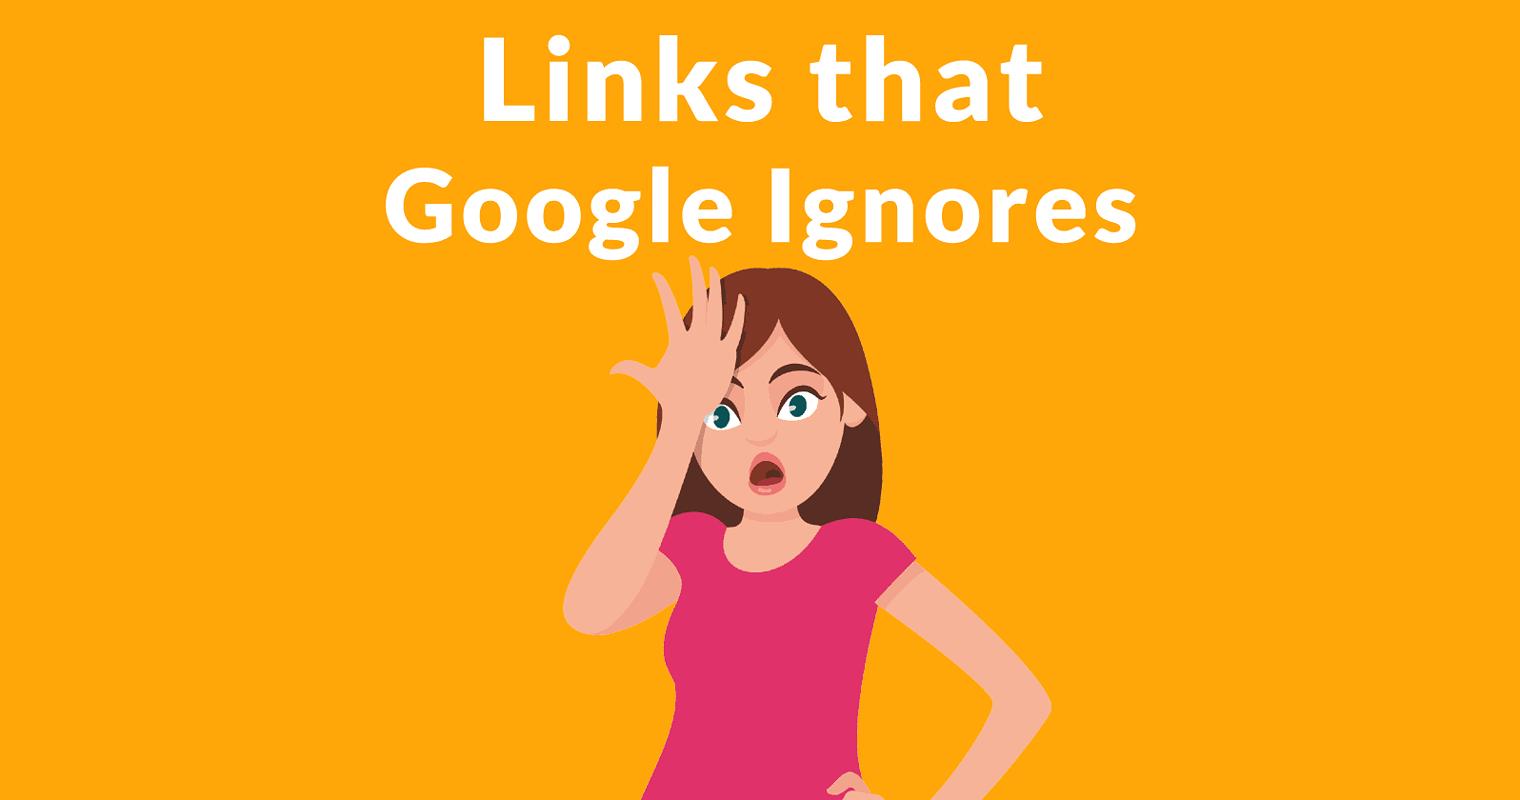 John Mueller Discusses Links that Google Ignores